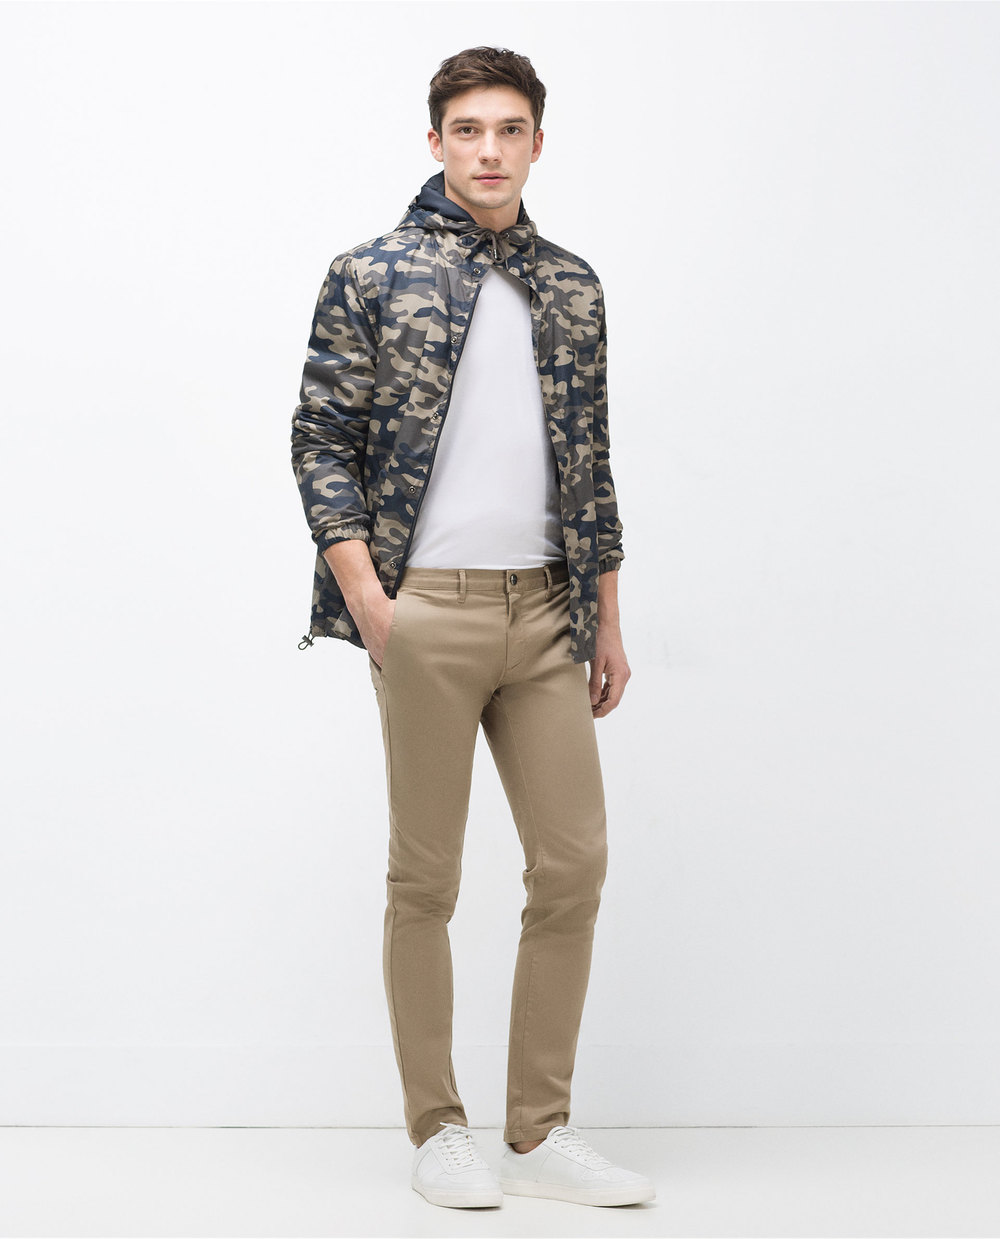 Zara Chinos, $39.90